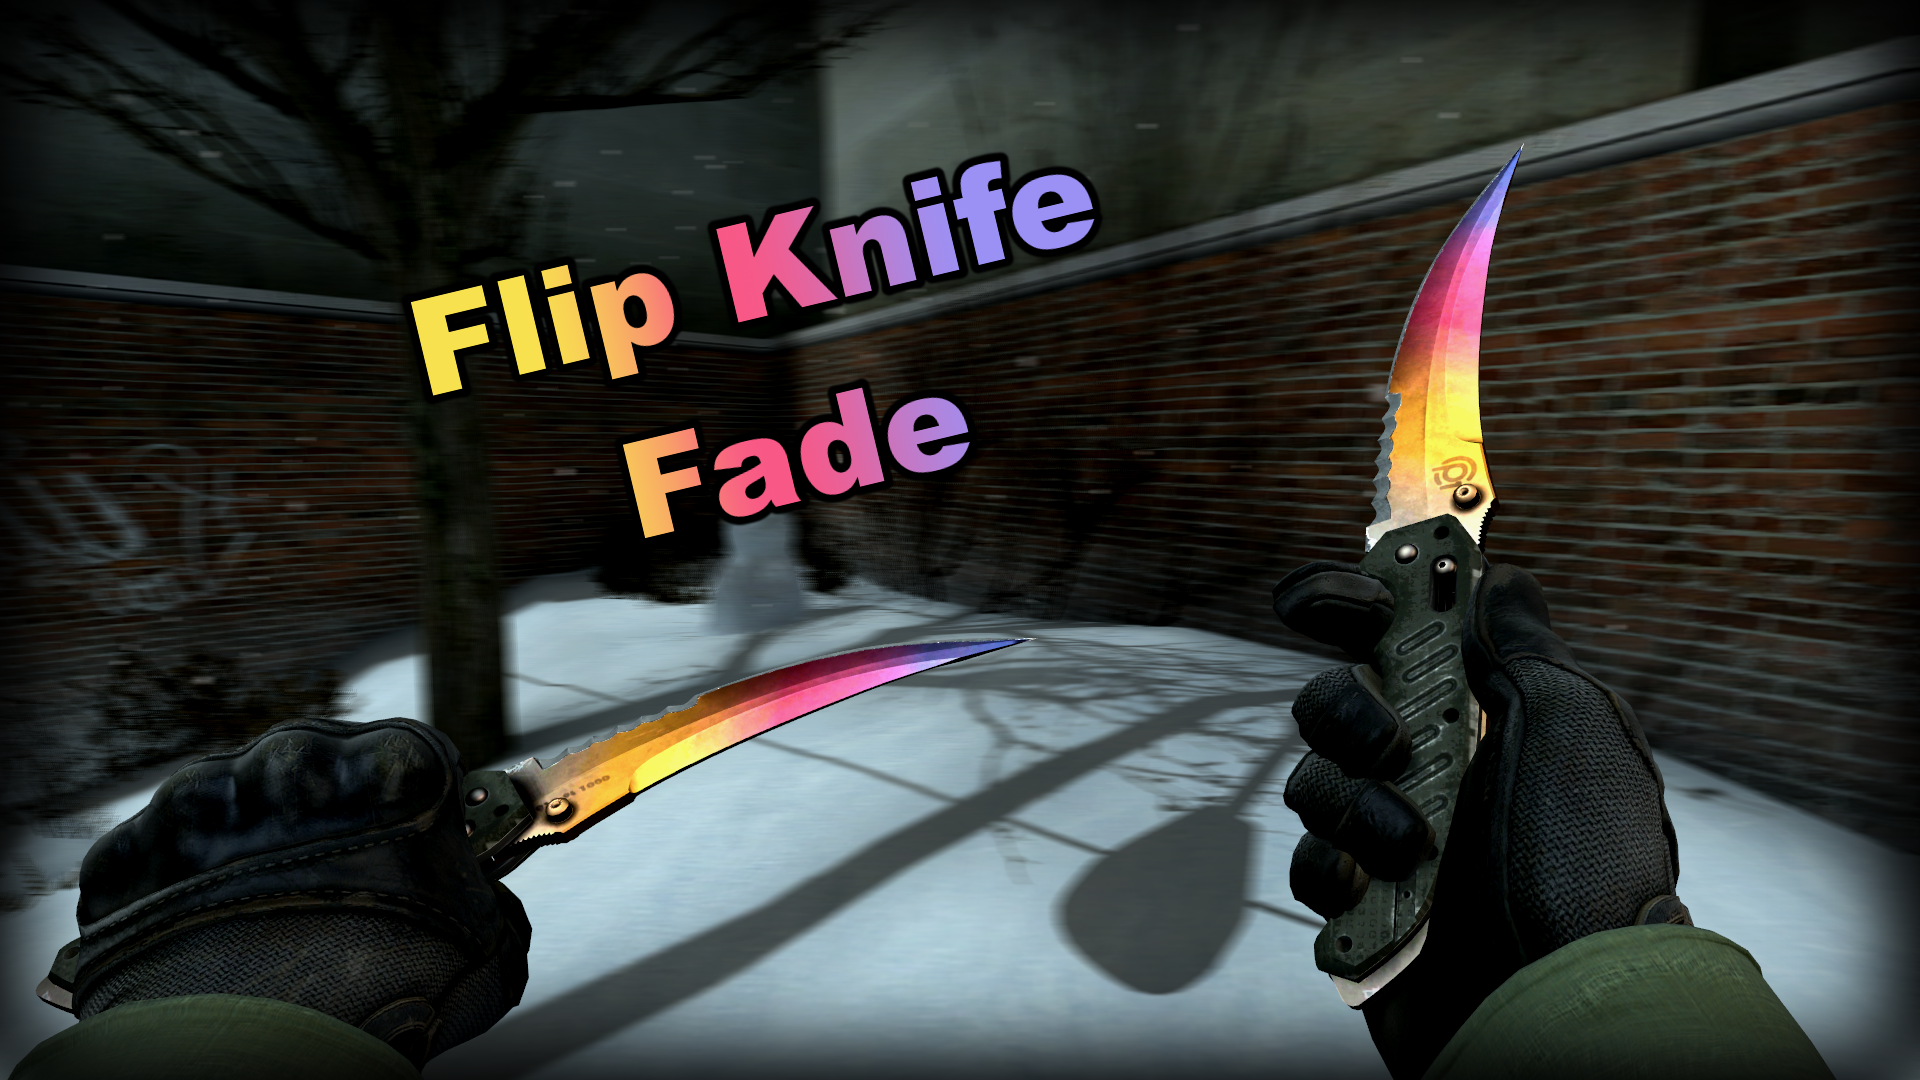 Flip Knife Fade 1 by krisser143 on DeviantArt